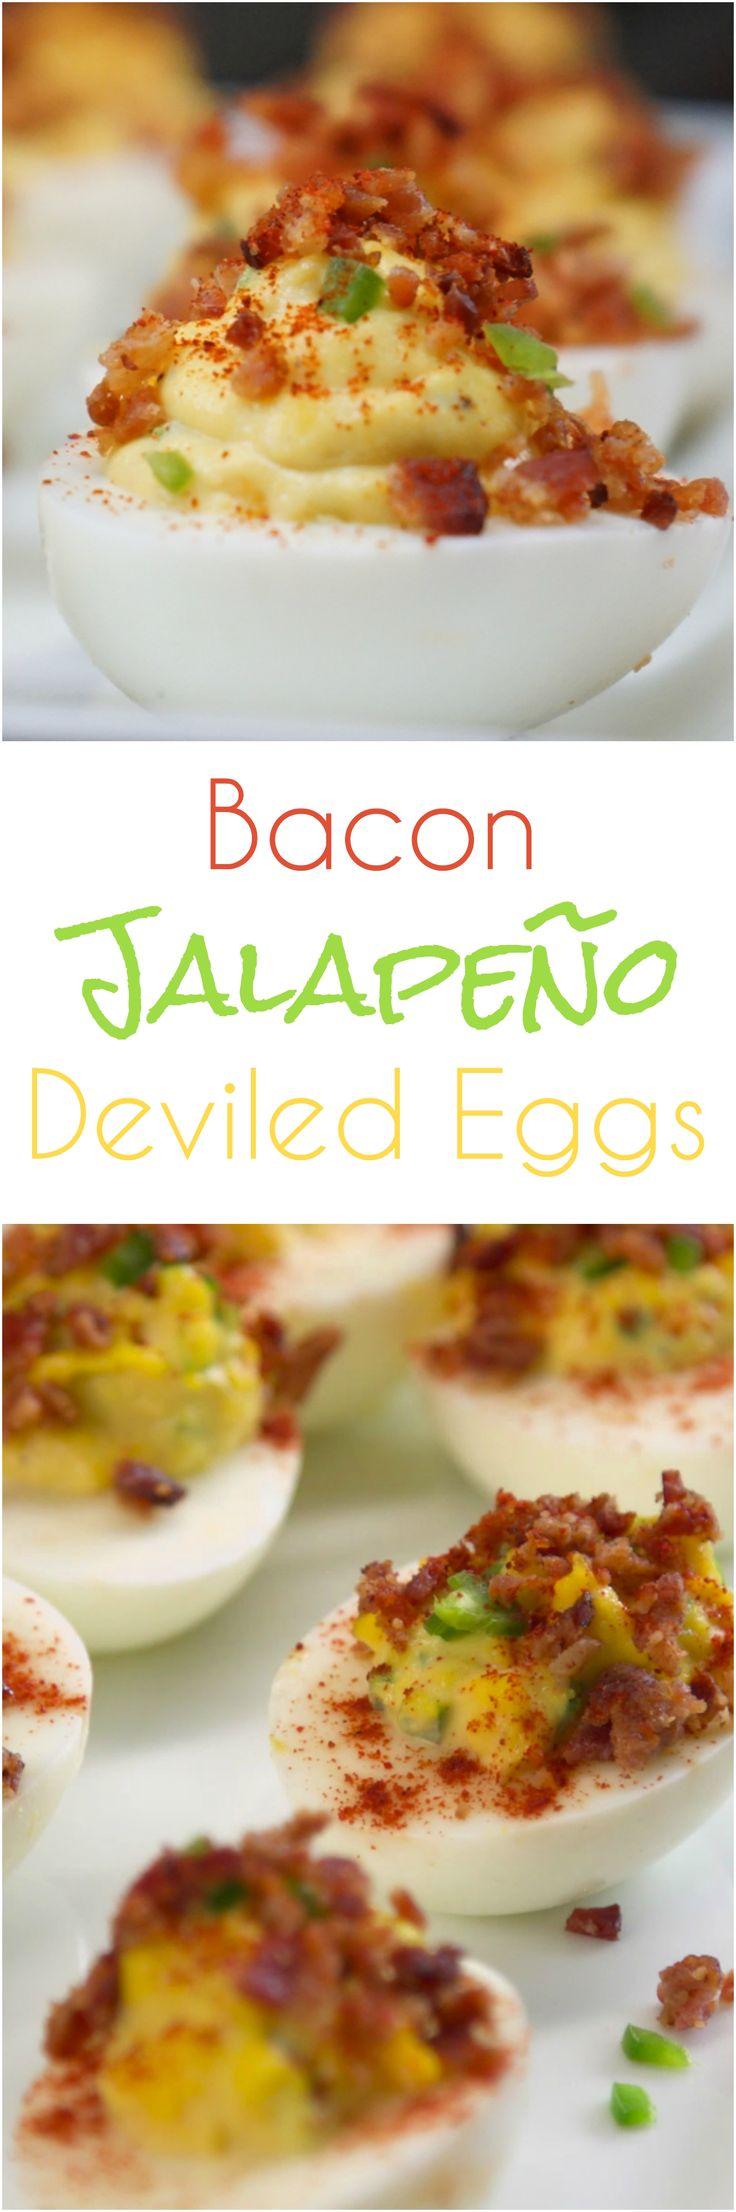 http://tiphero.com/bacon-jalapeno-deviled-eggs/